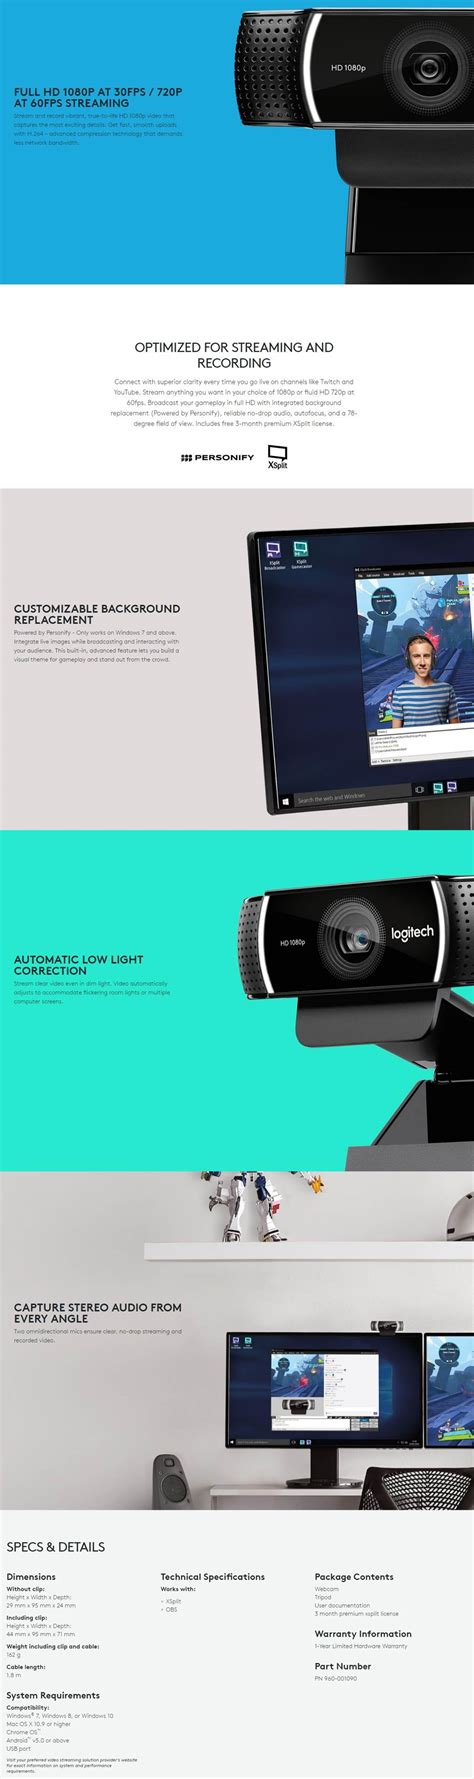 New Logitech C922 Pro Hd 1080p Includ Tripod Logitech C922 Hd Pro Hd 1080p Tripod